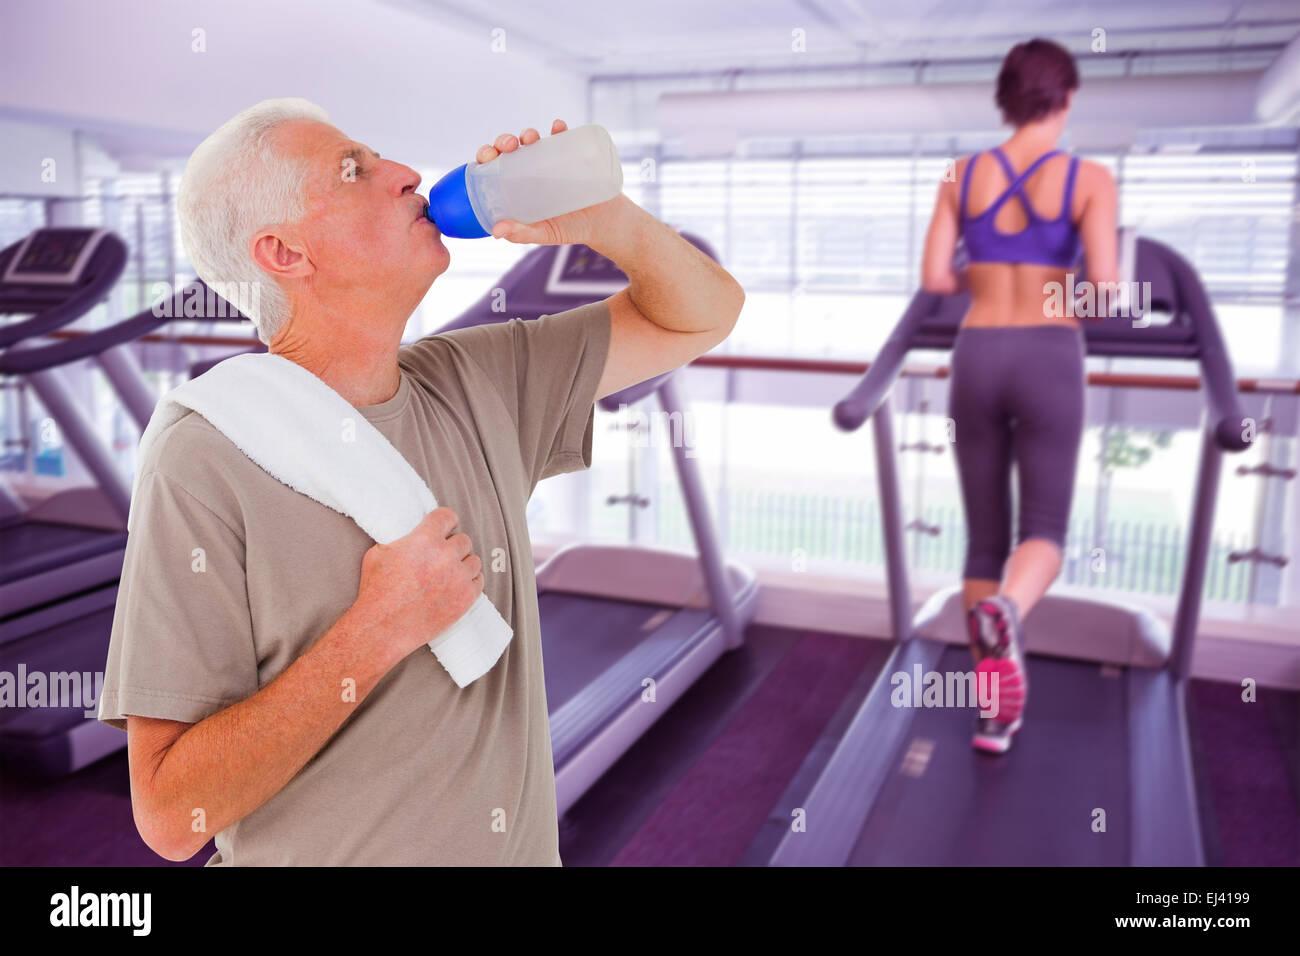 Senior man drinking from water bottle - Stock Image